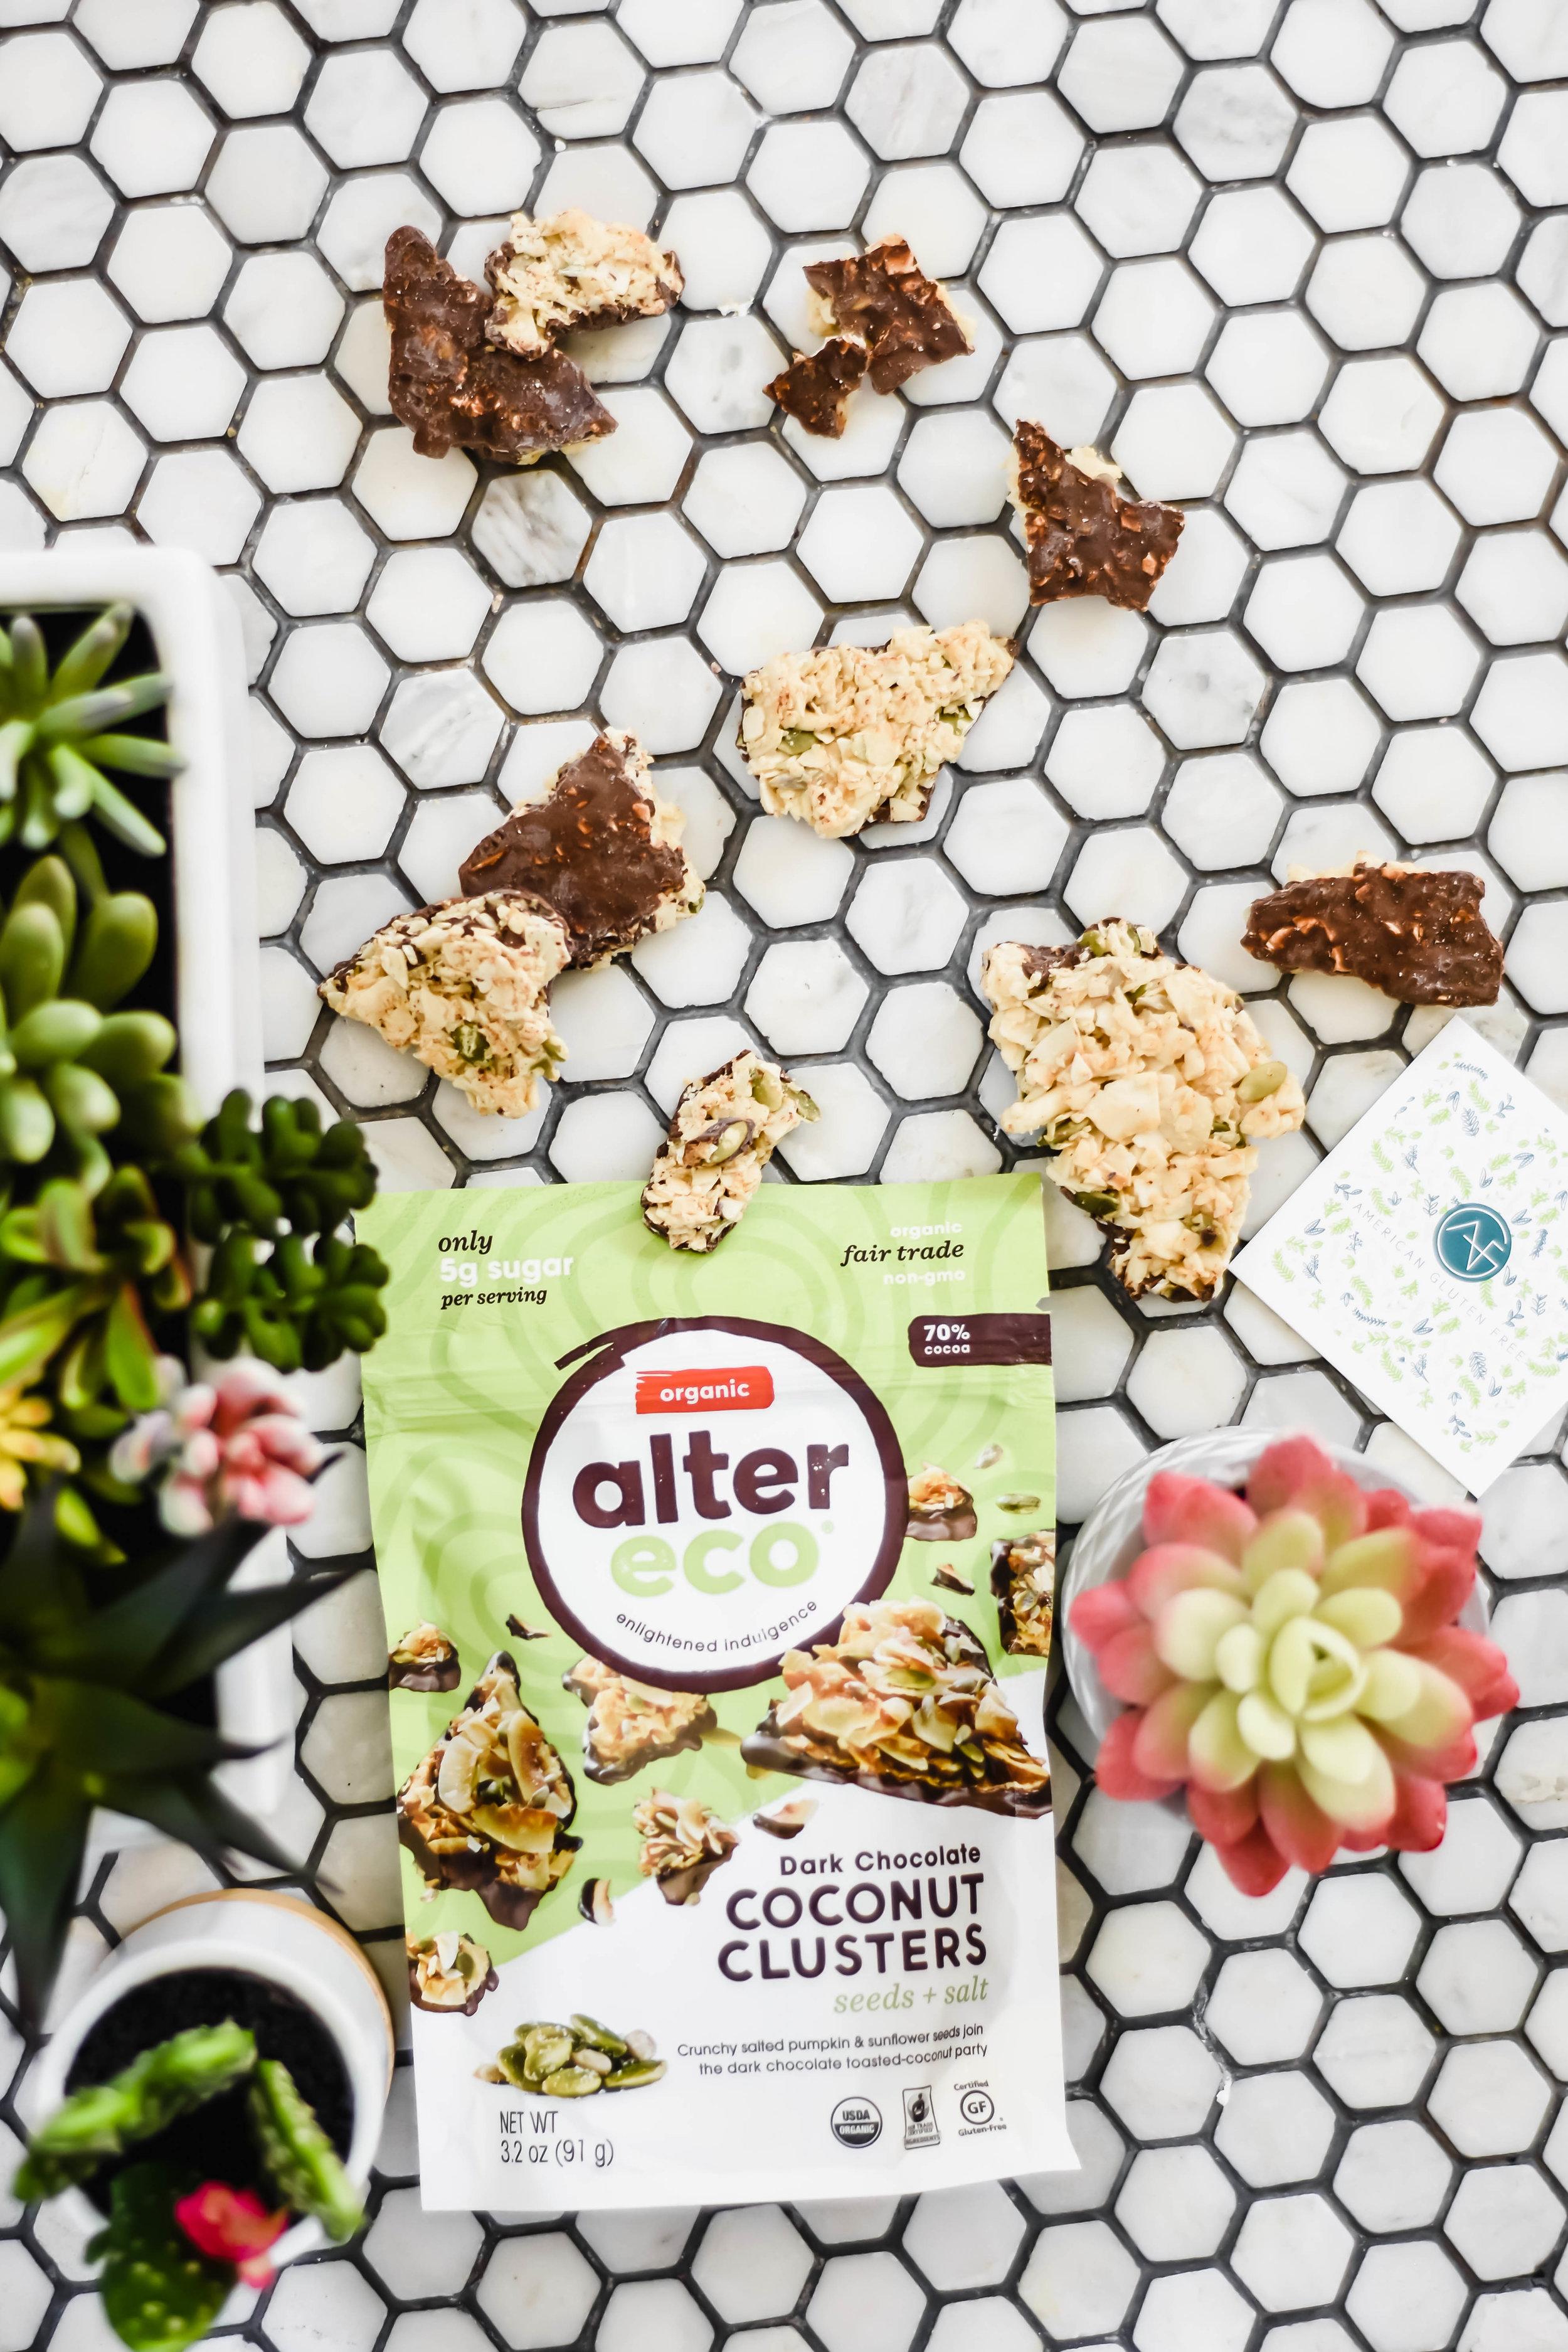 Altero Eco x American Gluten Free-2.jpg